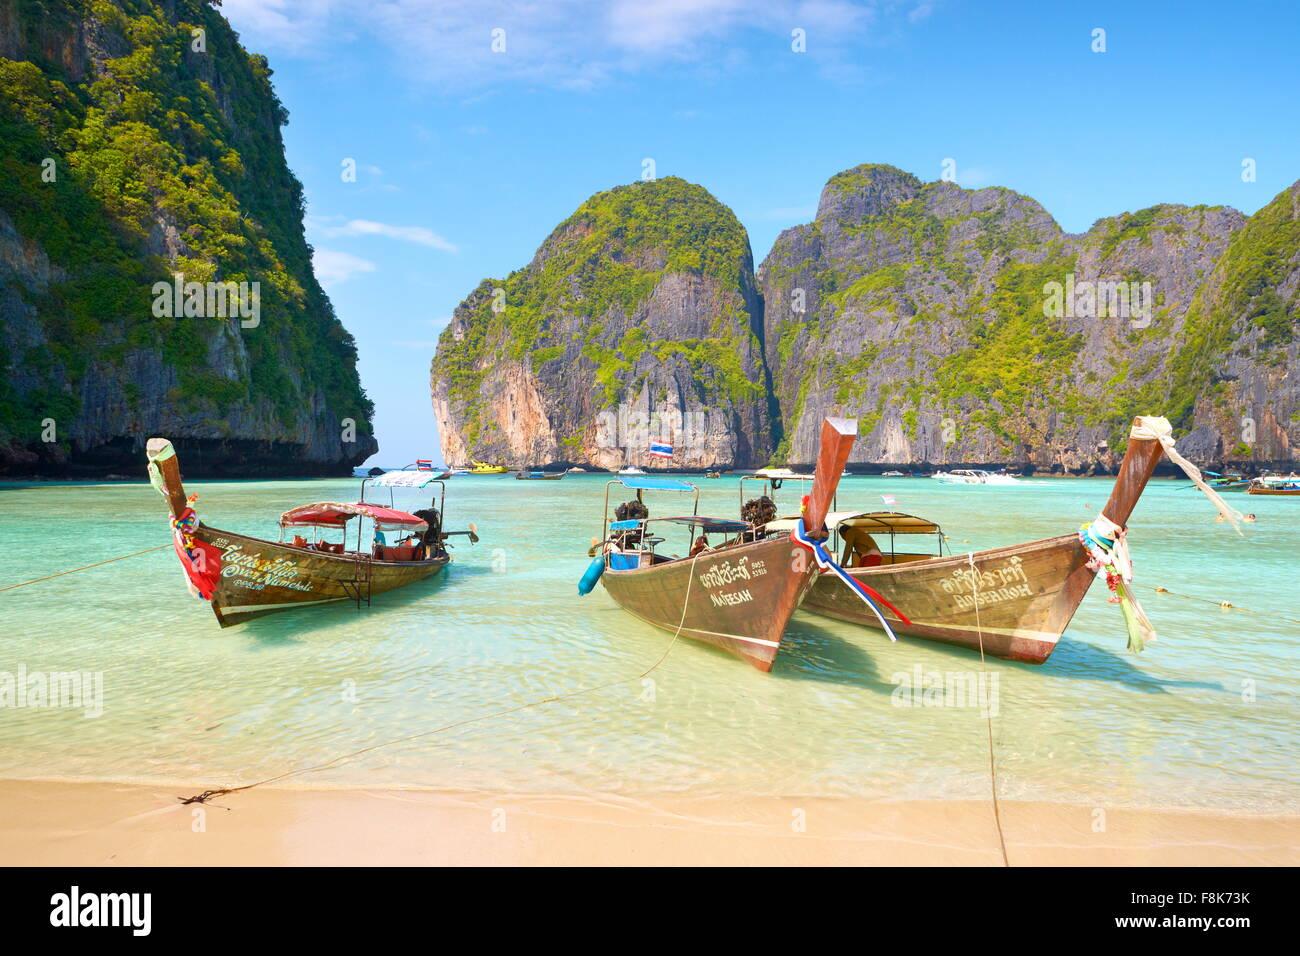 Tailandia playa tropical, Maya Bay, Phi Phi Leh, la Isla del Mar de Andaman, Asia Imagen De Stock